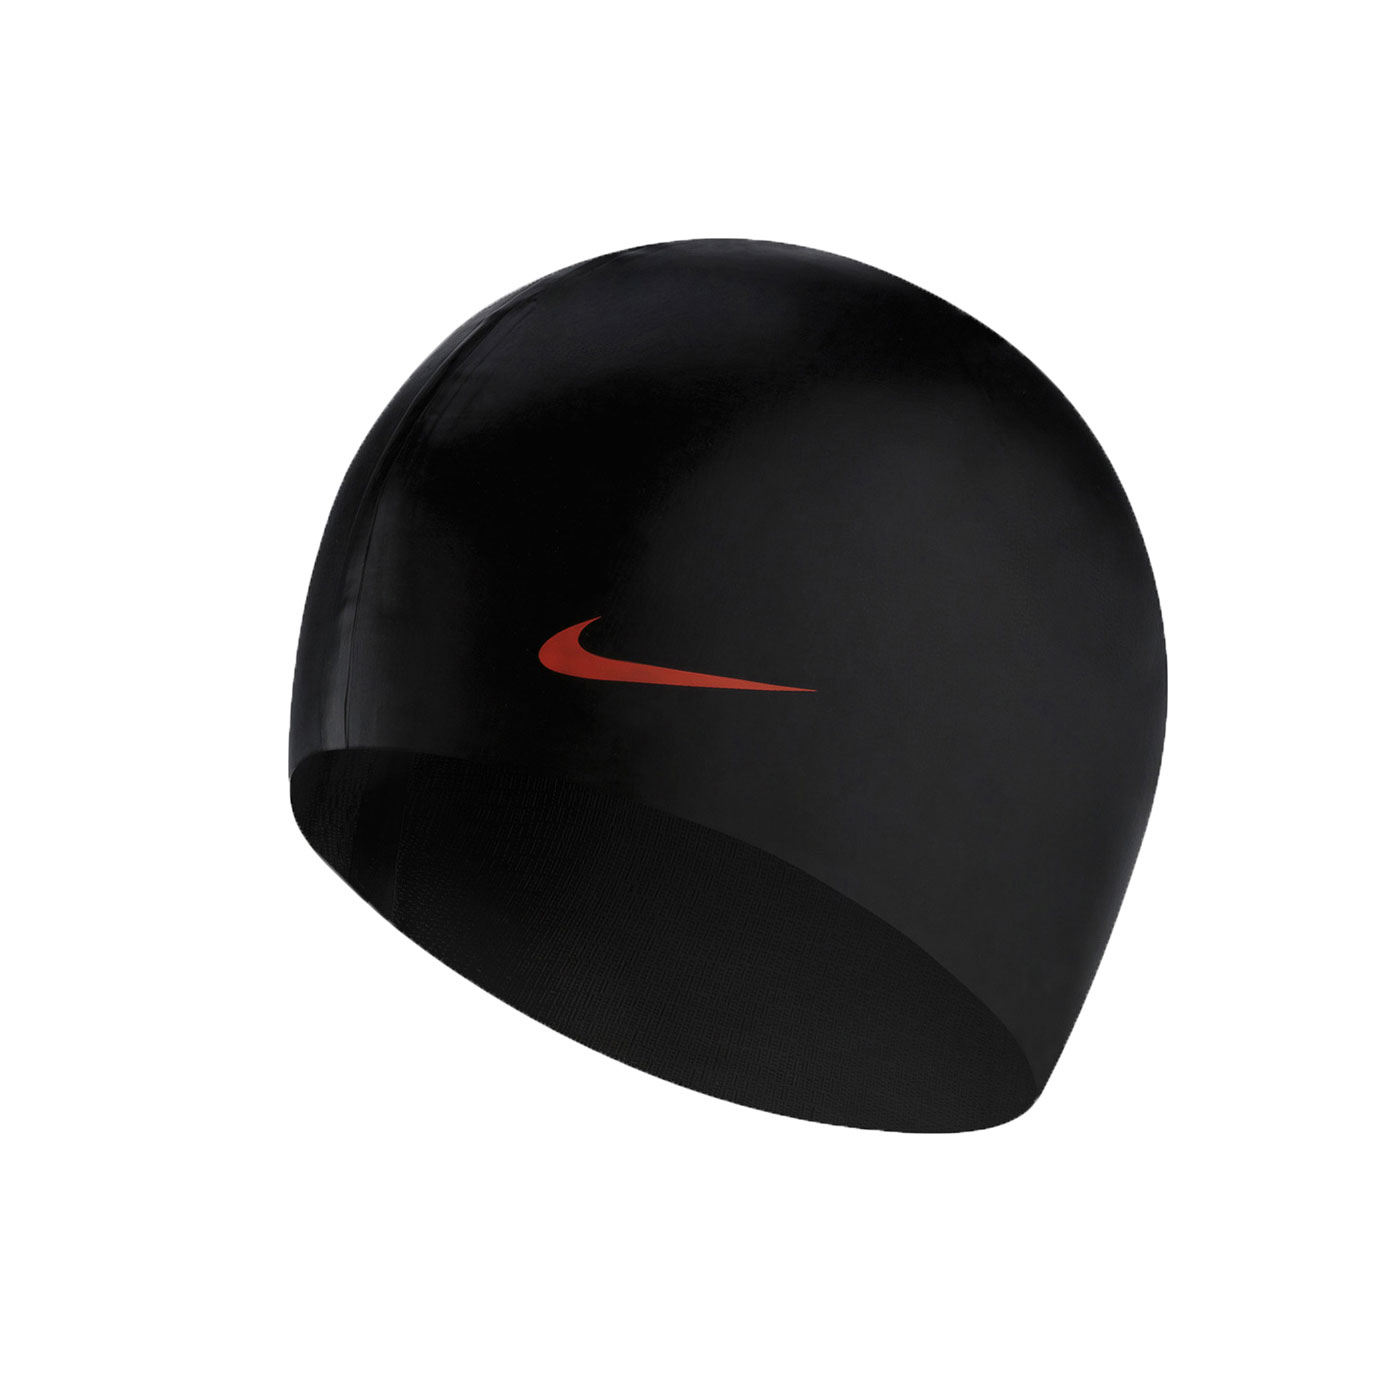 NIKE SWIM 成人矽膠泳帽 93060-001 - 黑橘